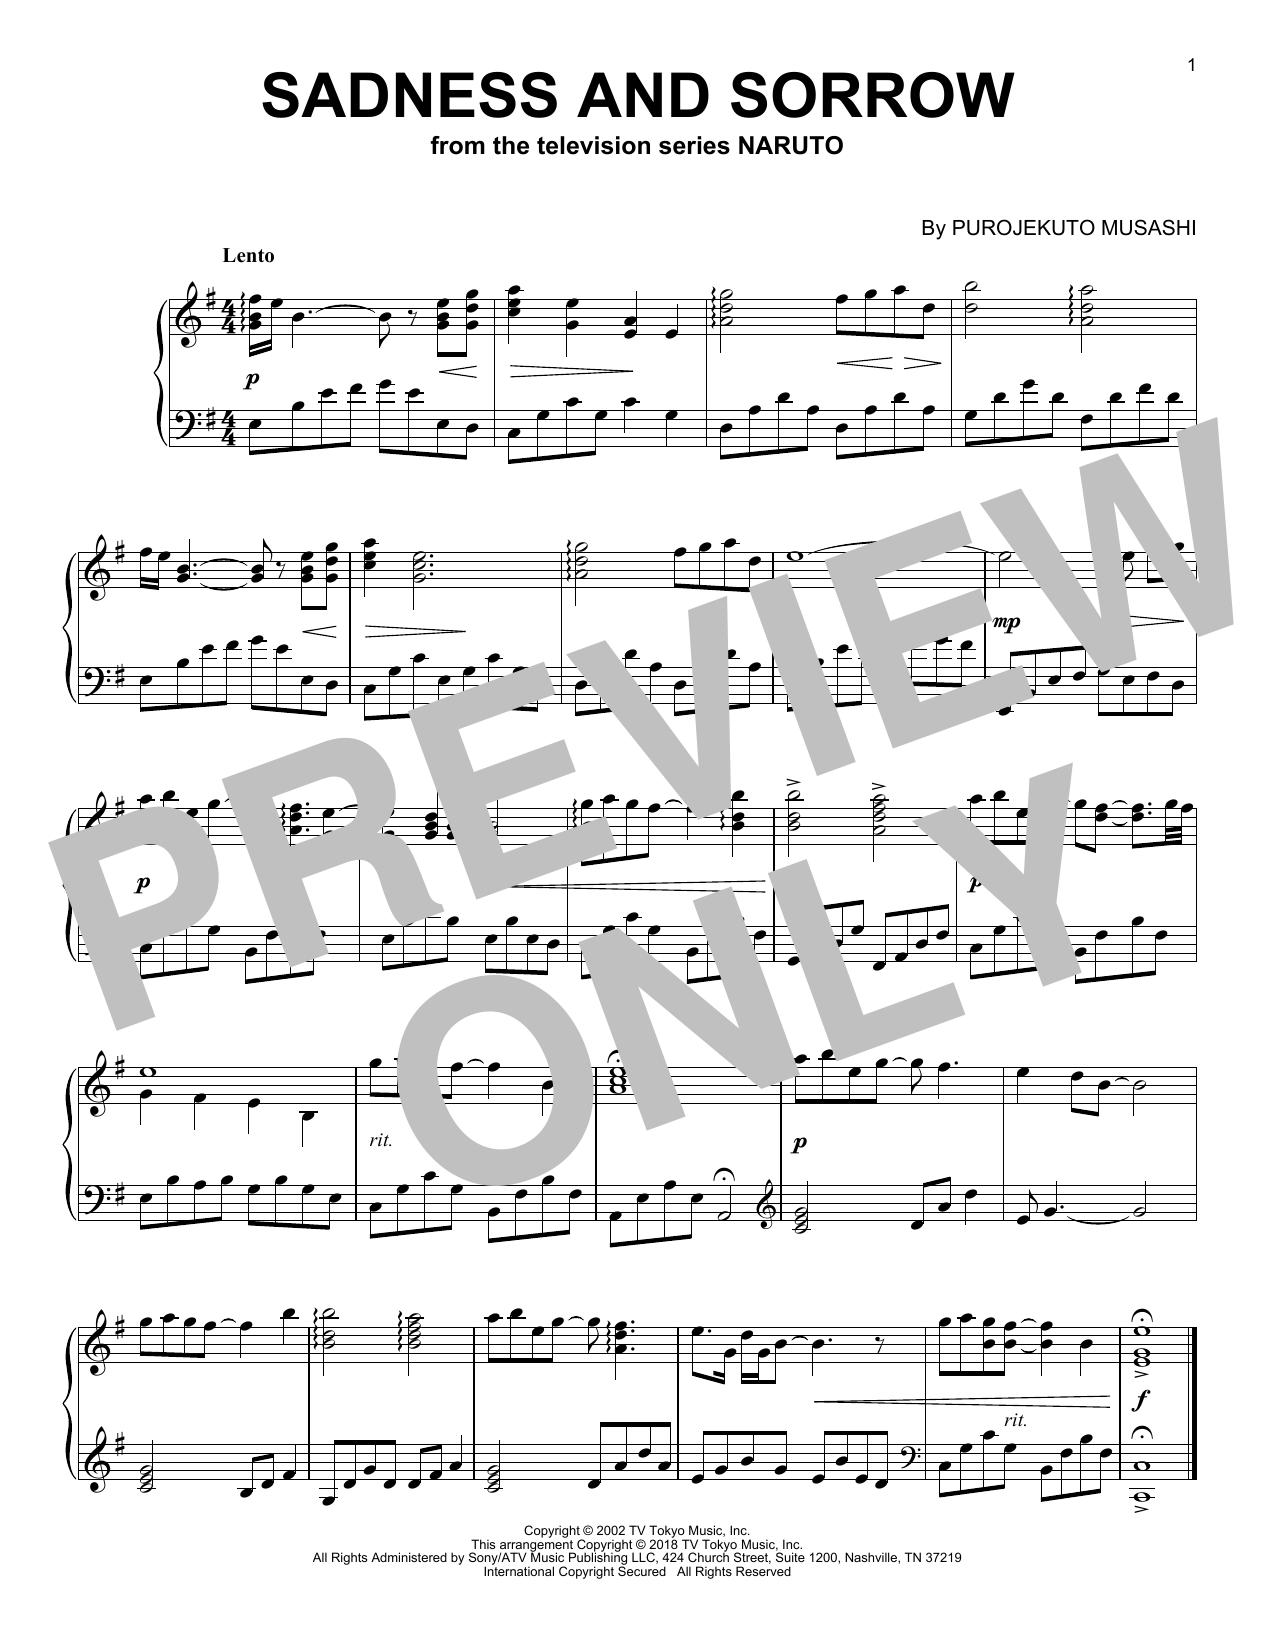 Download Purojekuto Musashi 'Sadness And Sorrow' Digital Sheet Music Notes & Chords and start playing in minutes